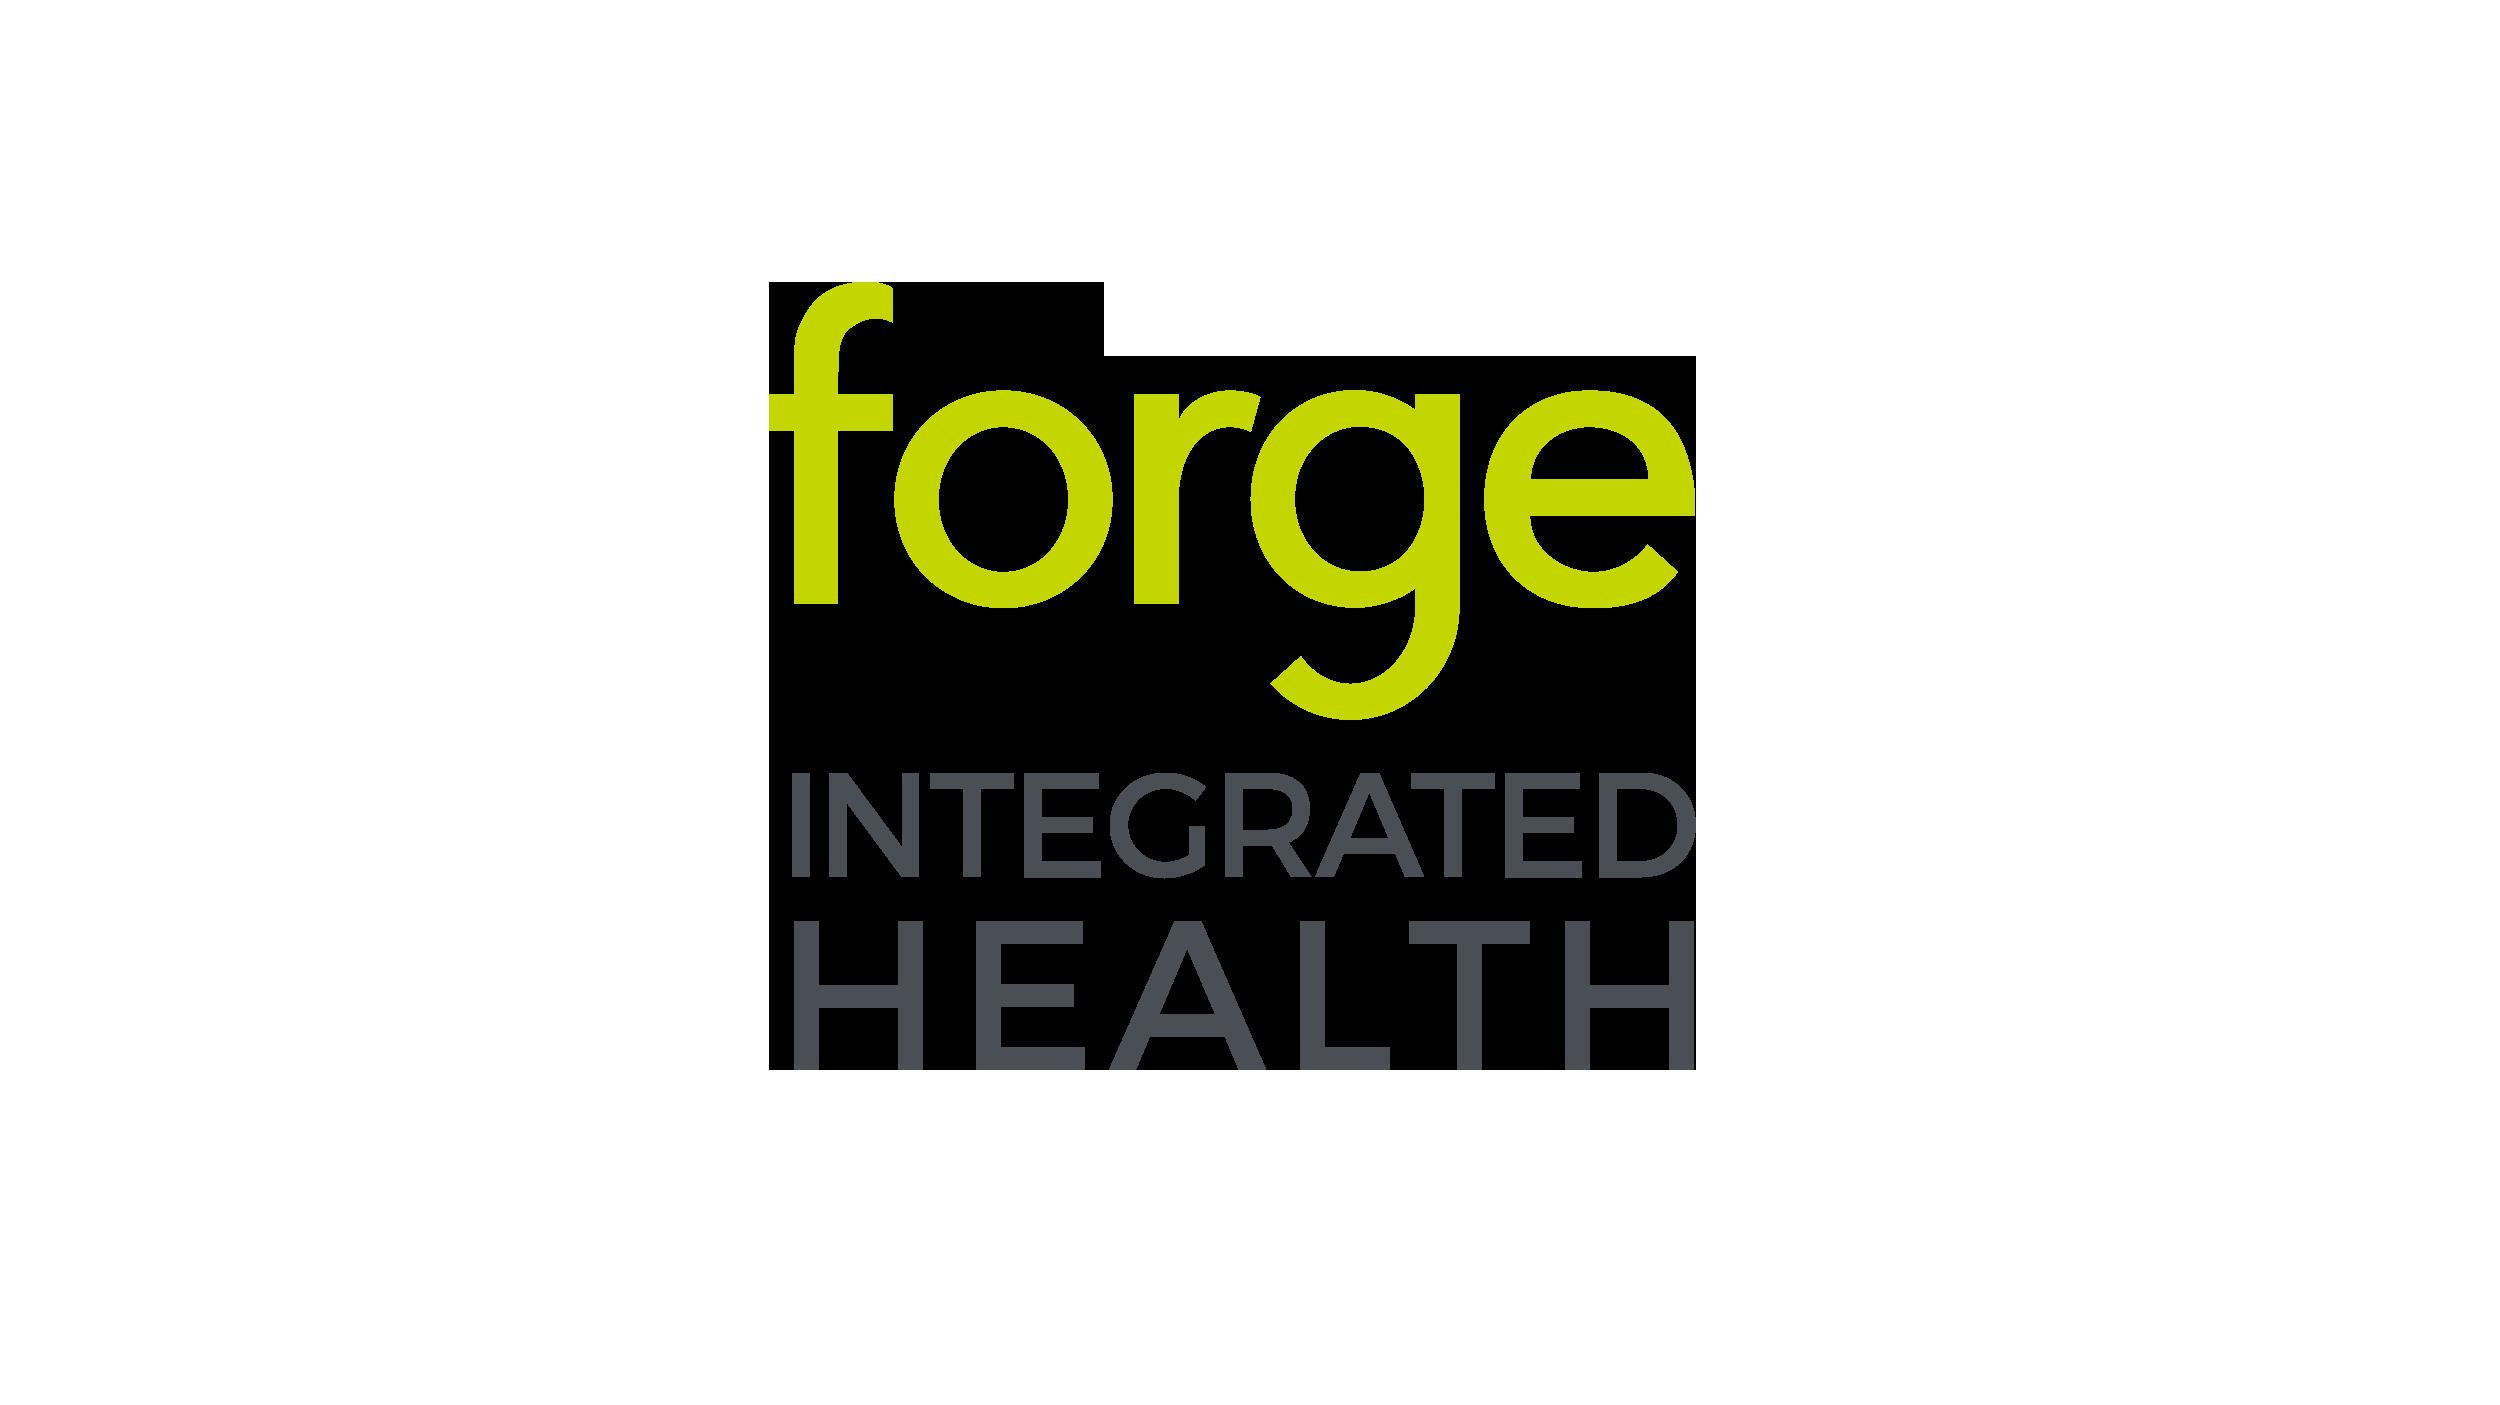 katelynbishop_design_forge_logo1